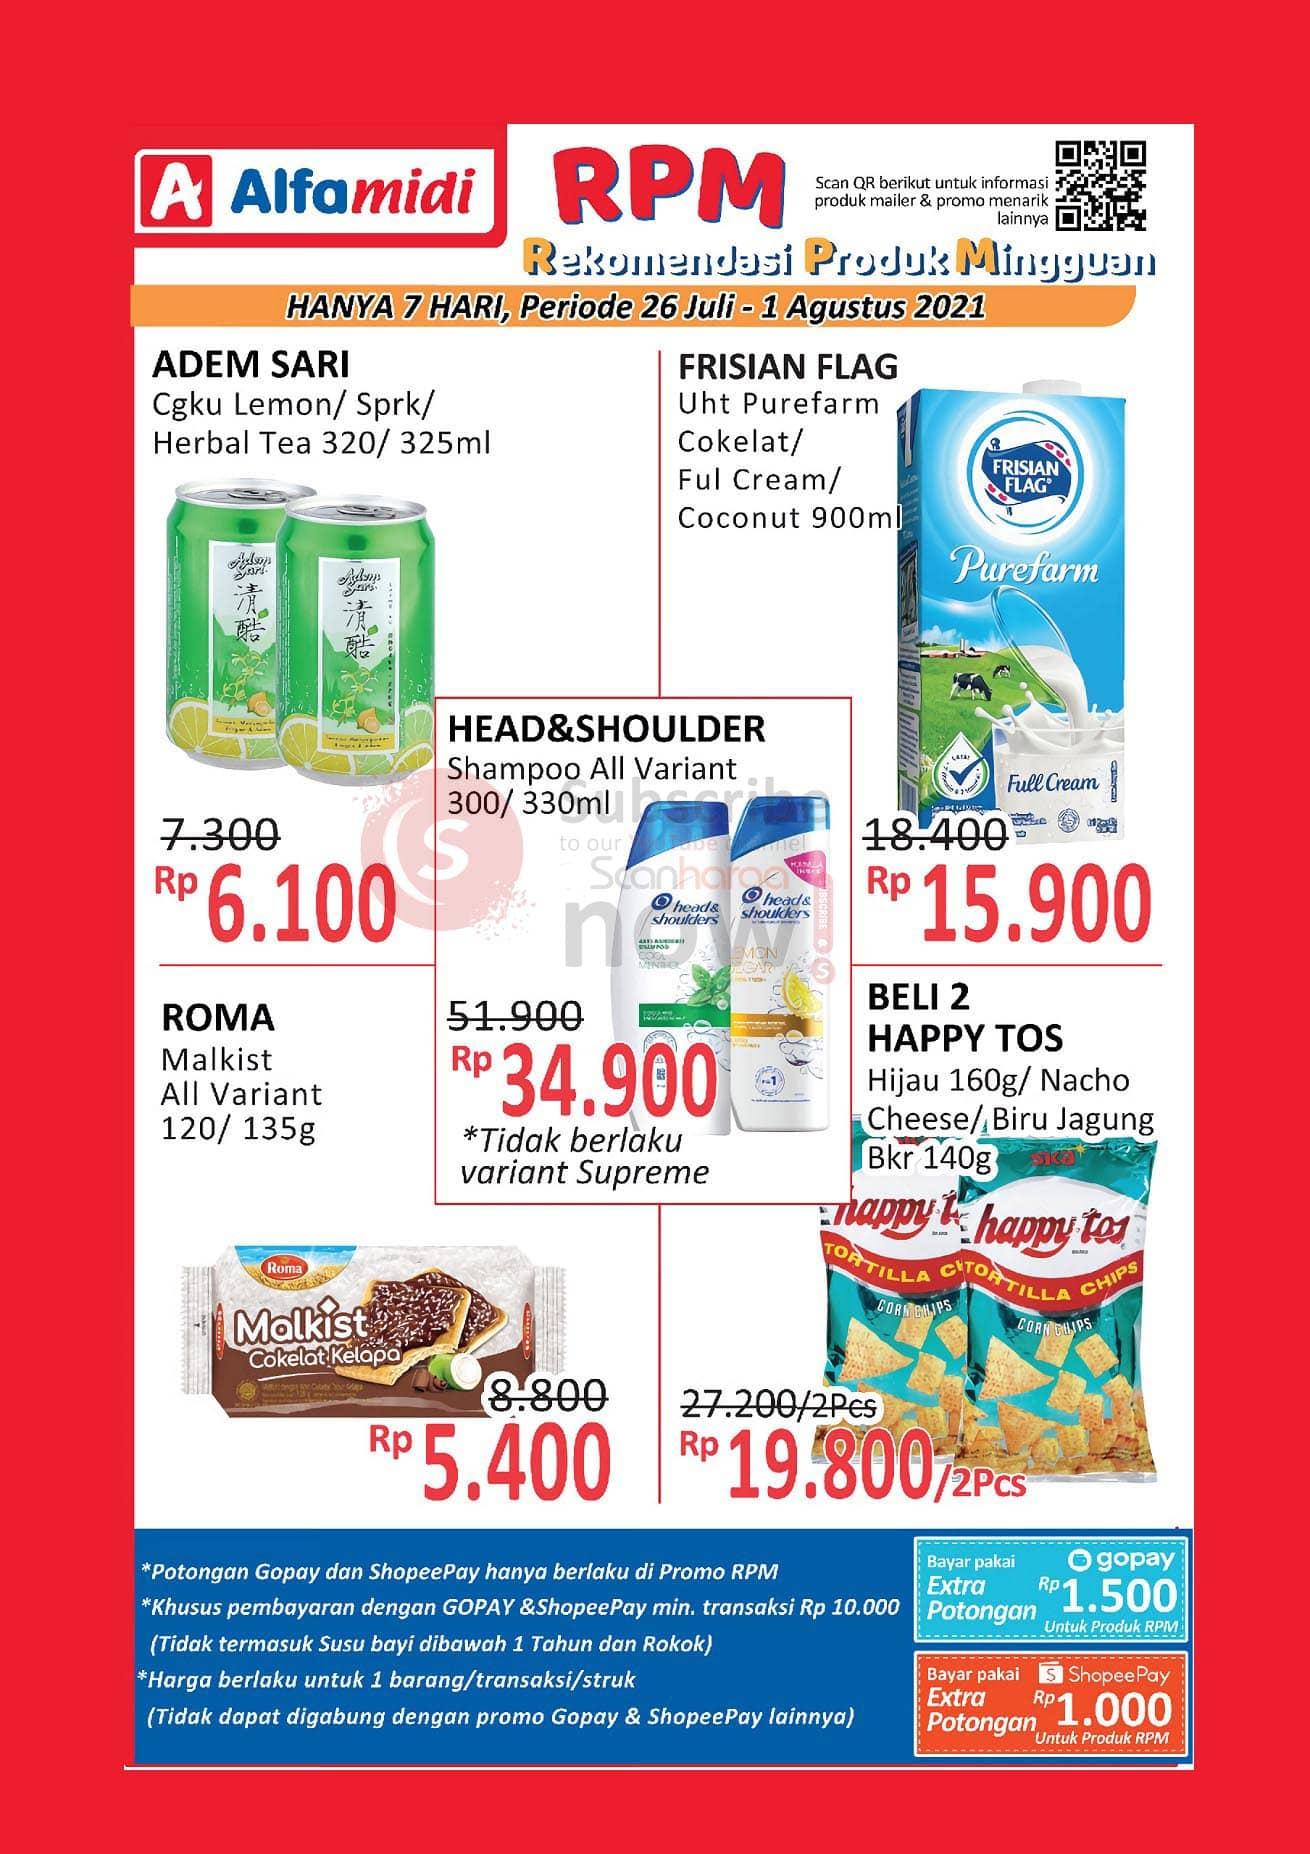 Promo ALFAMIDI RPM Periode 26 Juli - 1 Agustus 2021